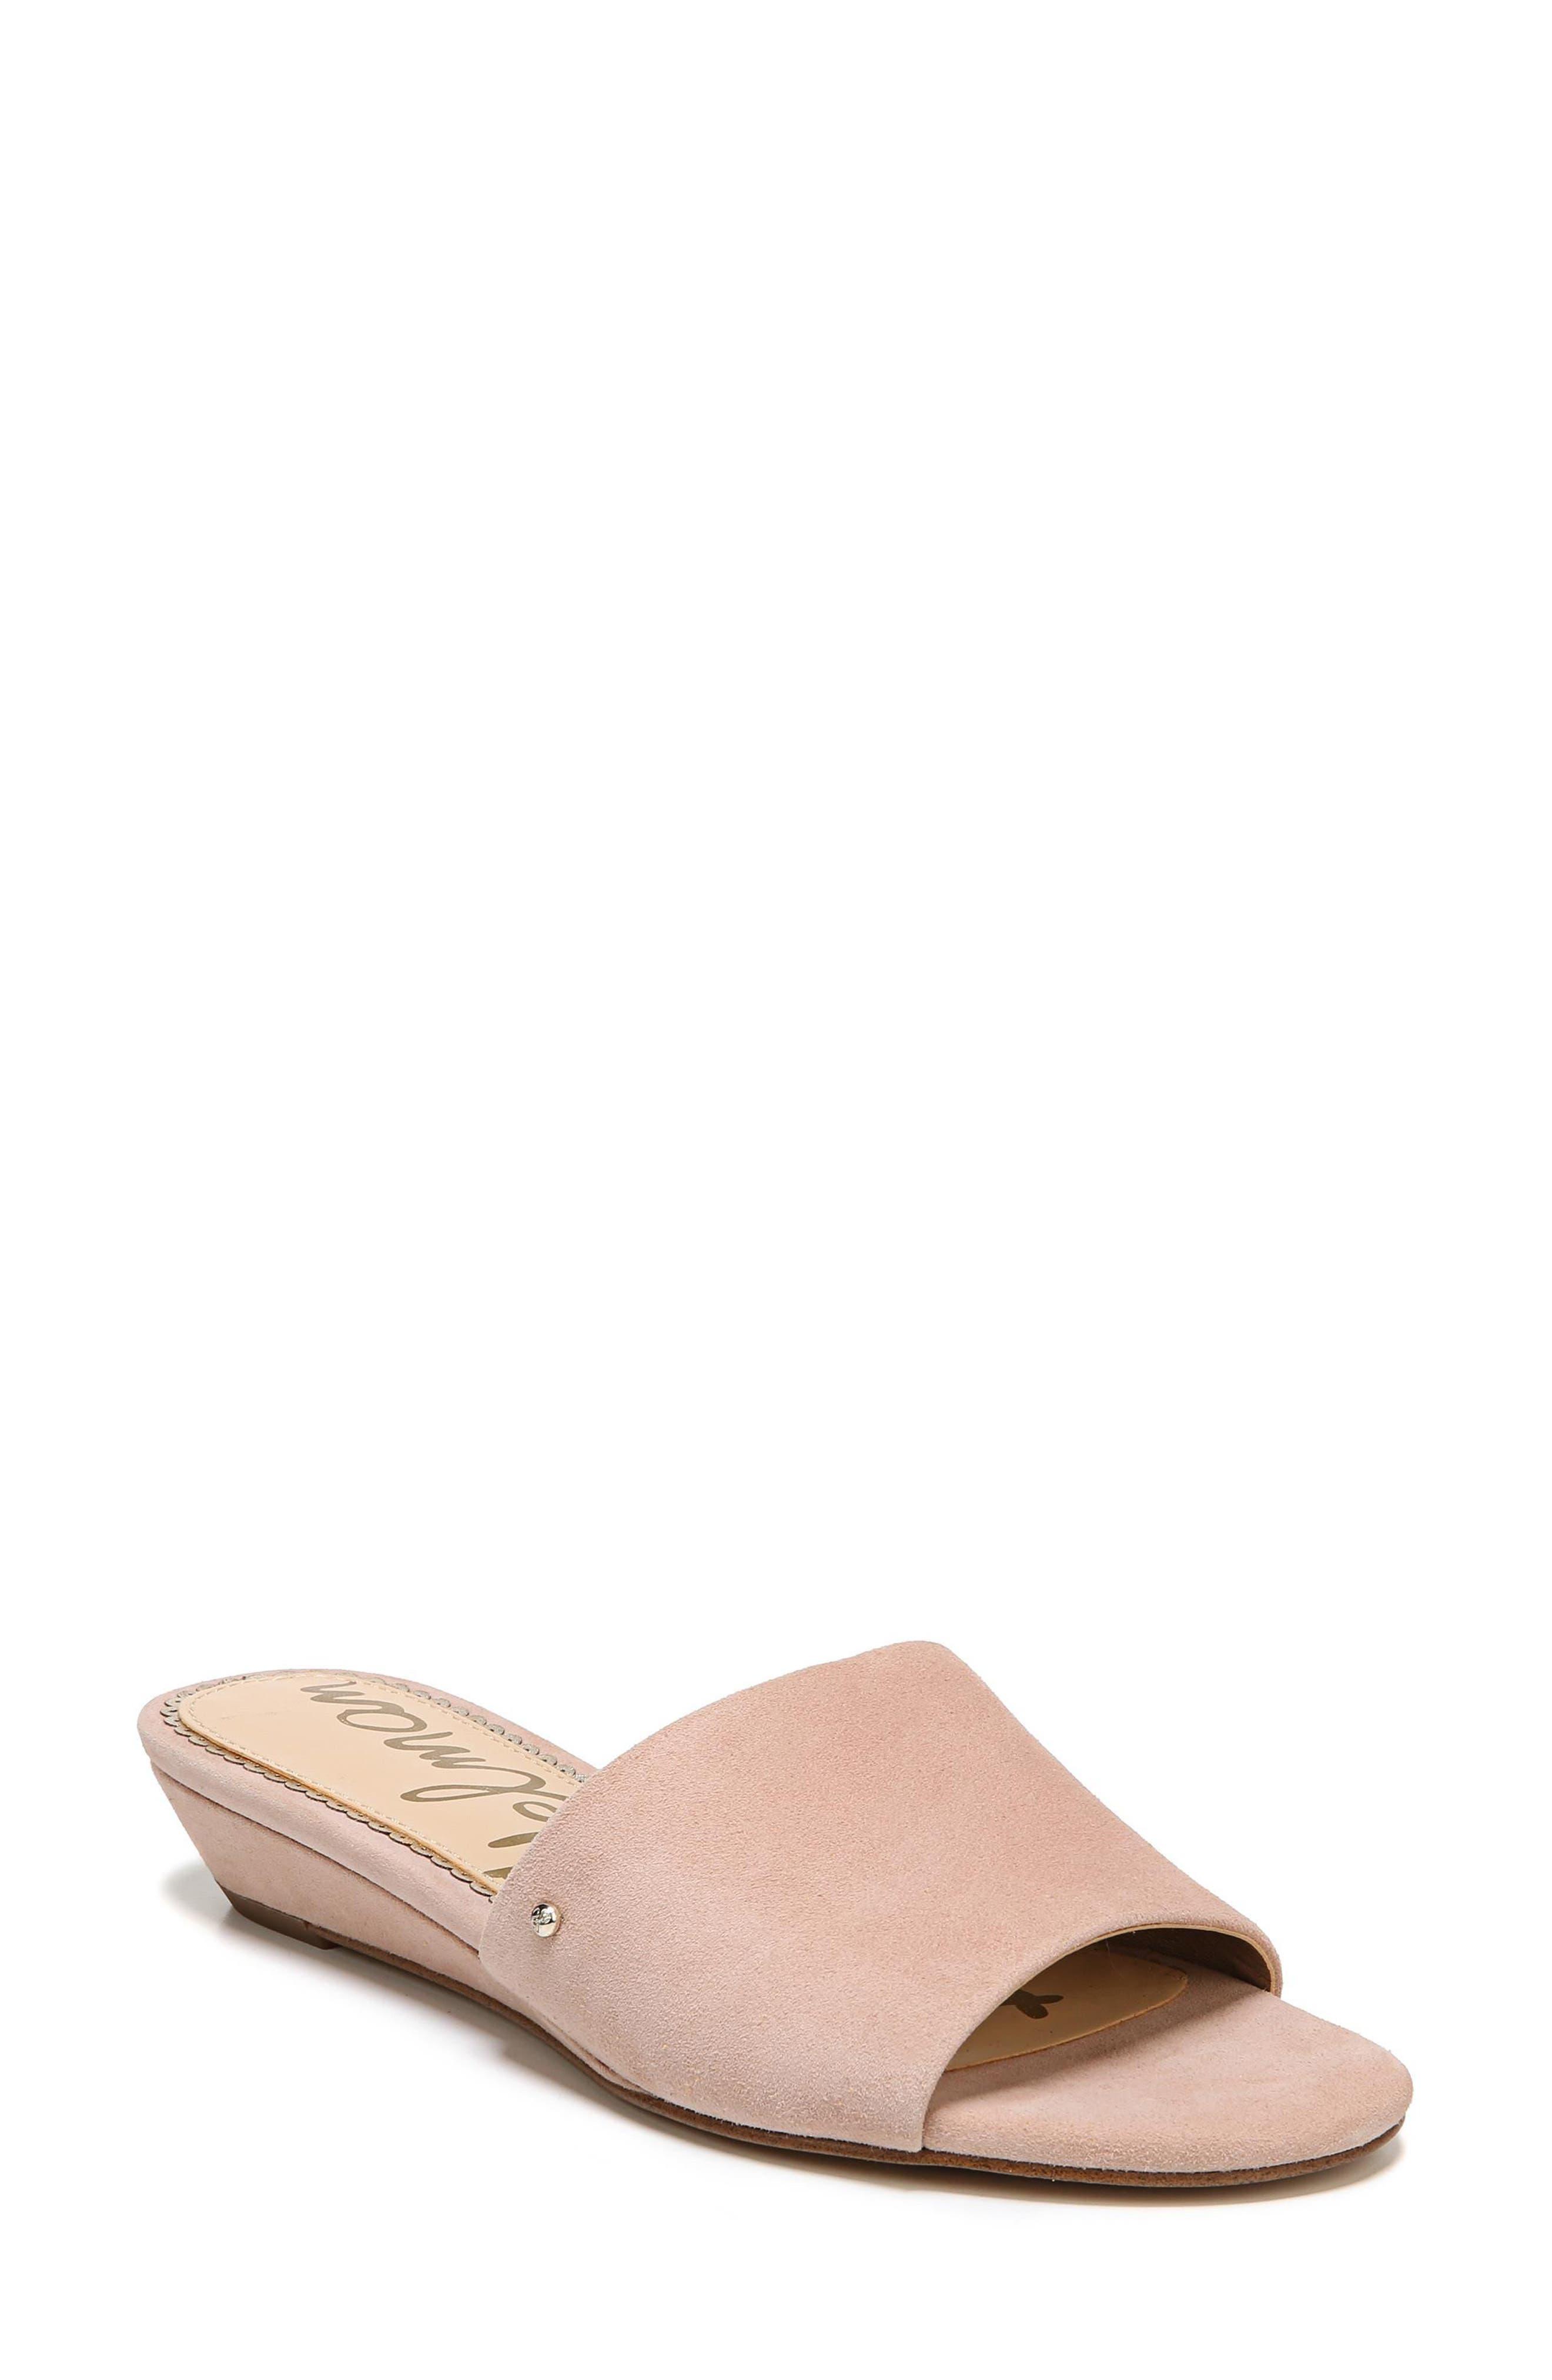 61a52792d3ca Liliana shoes Source · Sam Edelman Women S Liliana Suede Demi Wedge Slide  Sandals In Blush